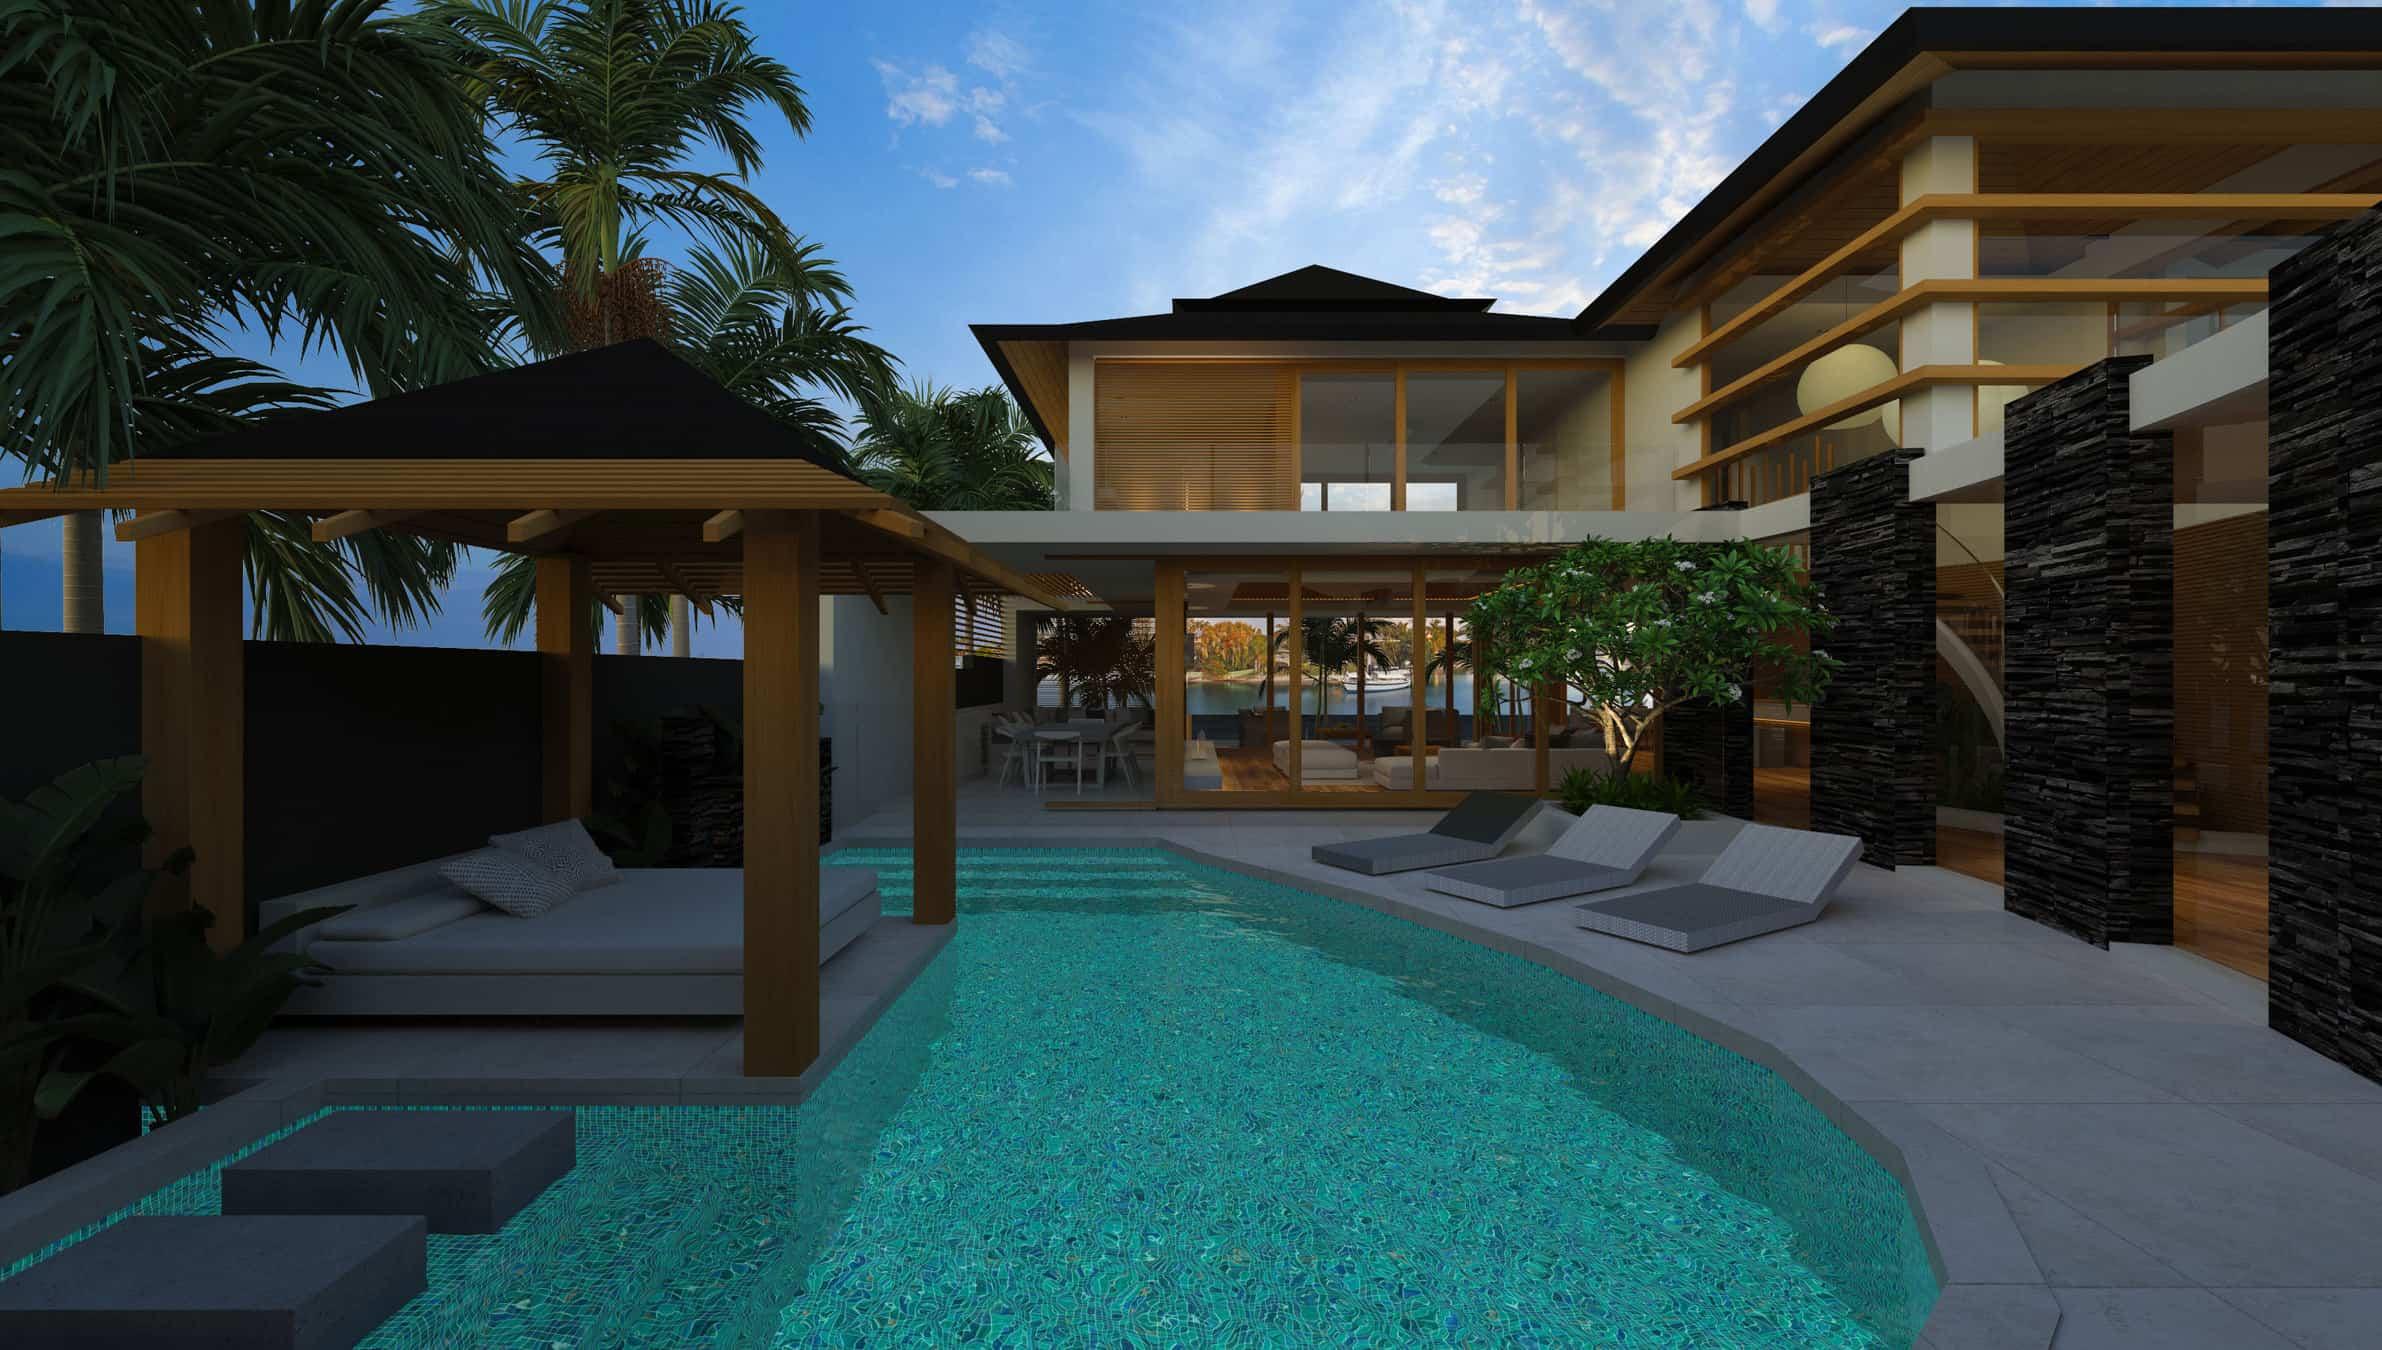 Home Renovation Design Online South Pacific House Chris Clout Design